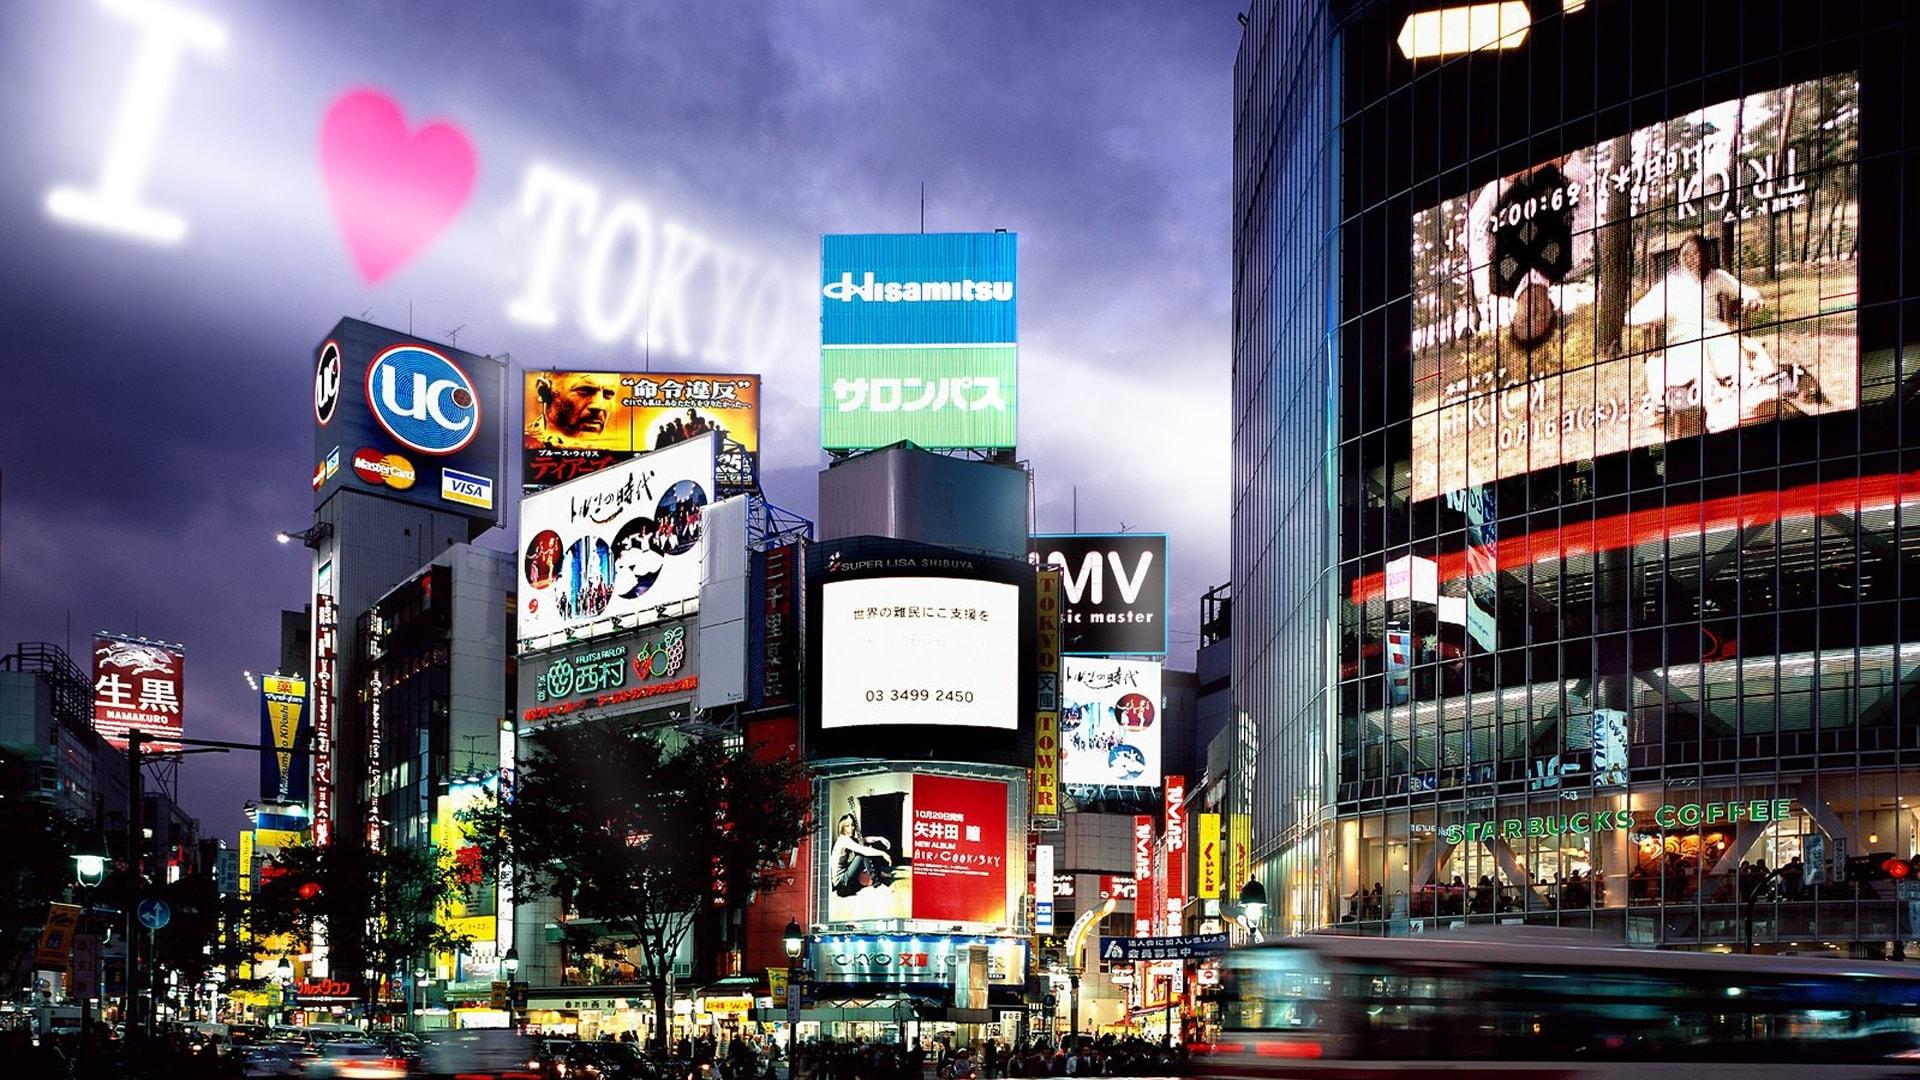 Tokyo widescreen for desktop